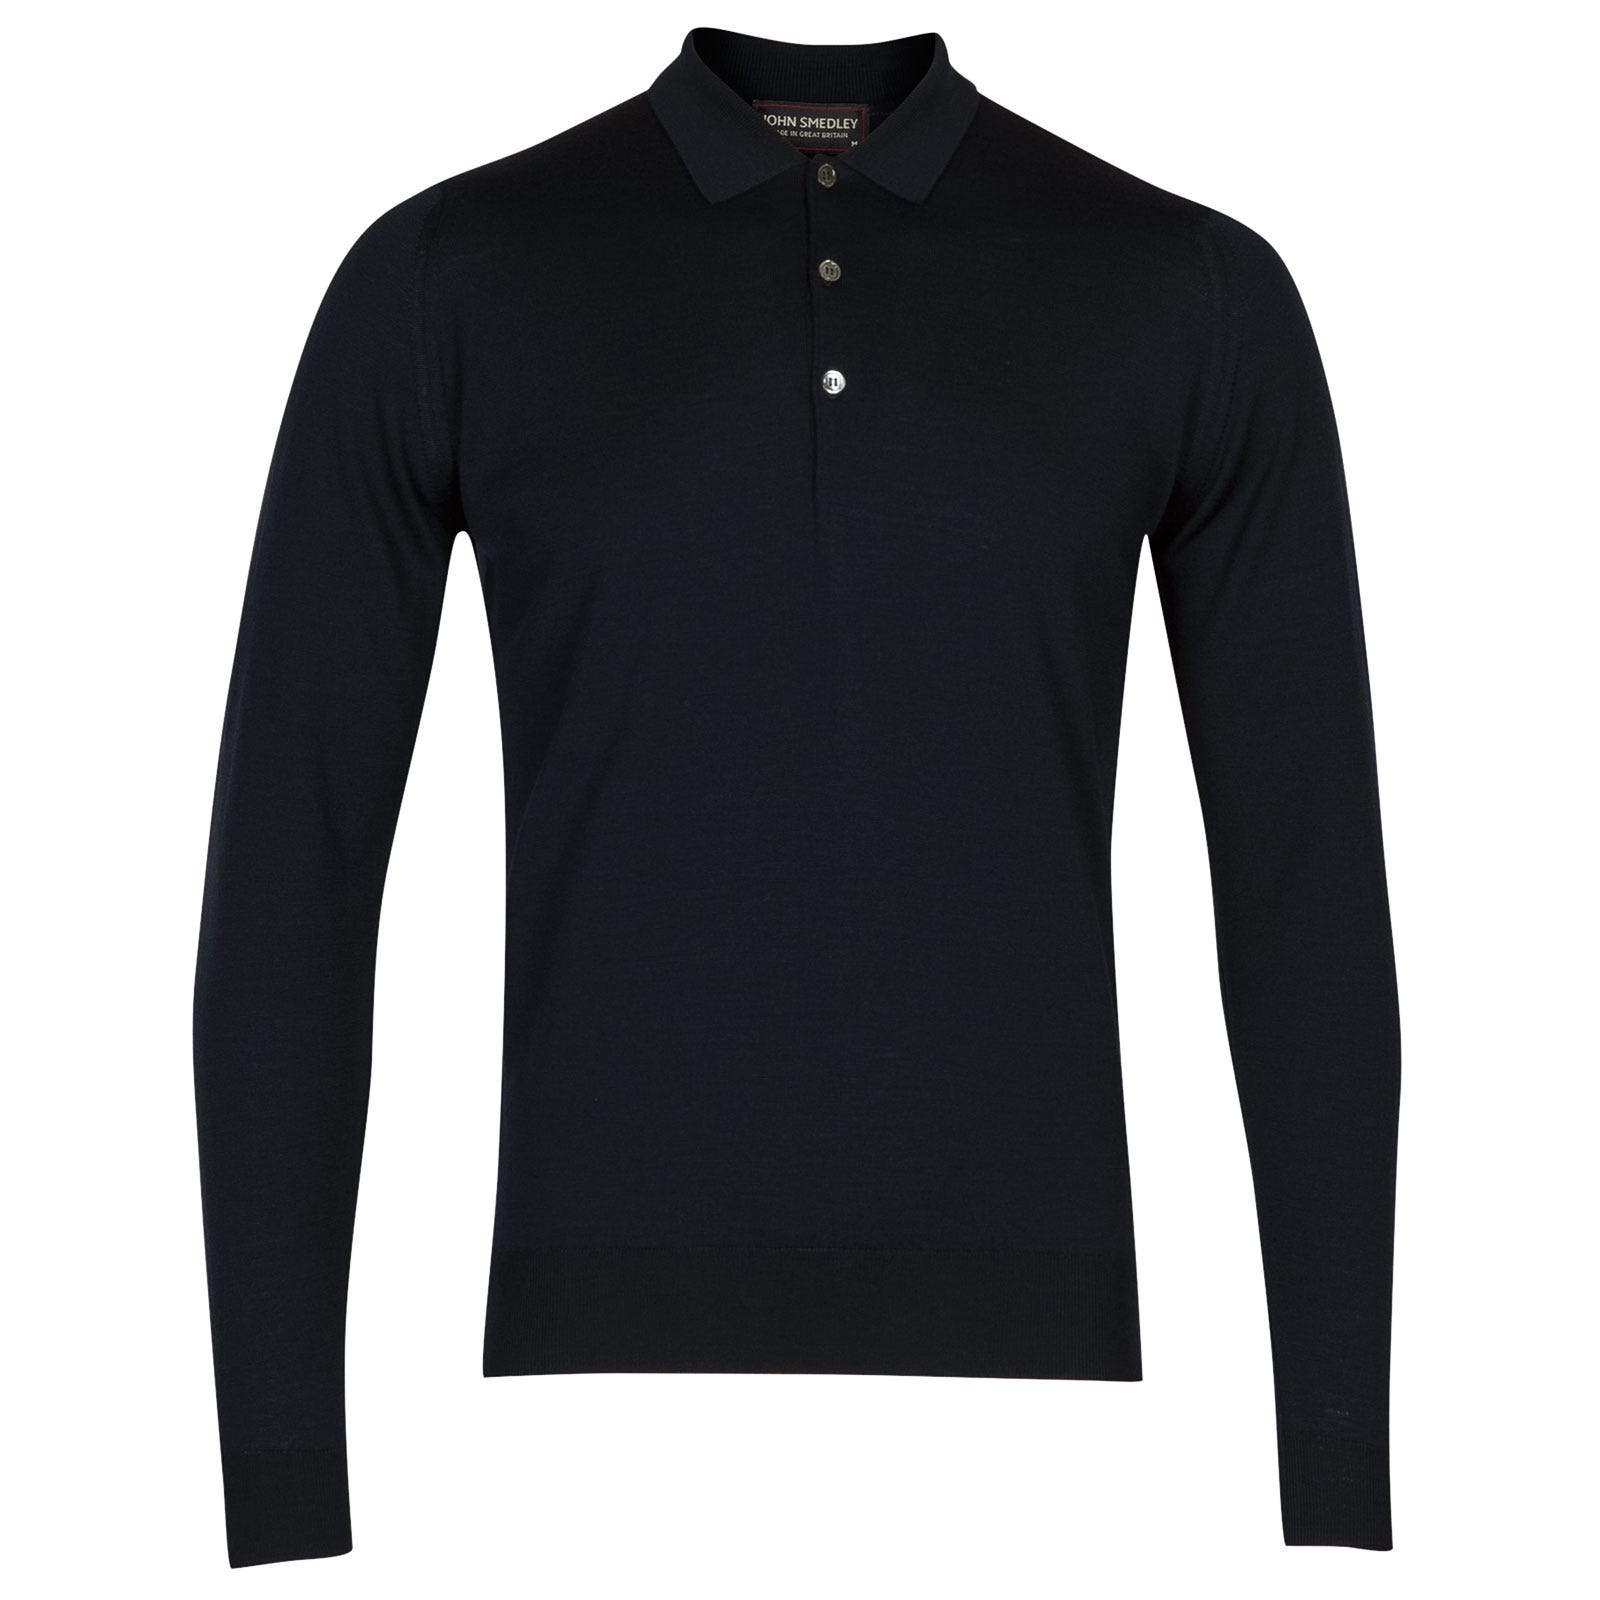 John Smedley belper Merino Wool Shirt in Midnight-M